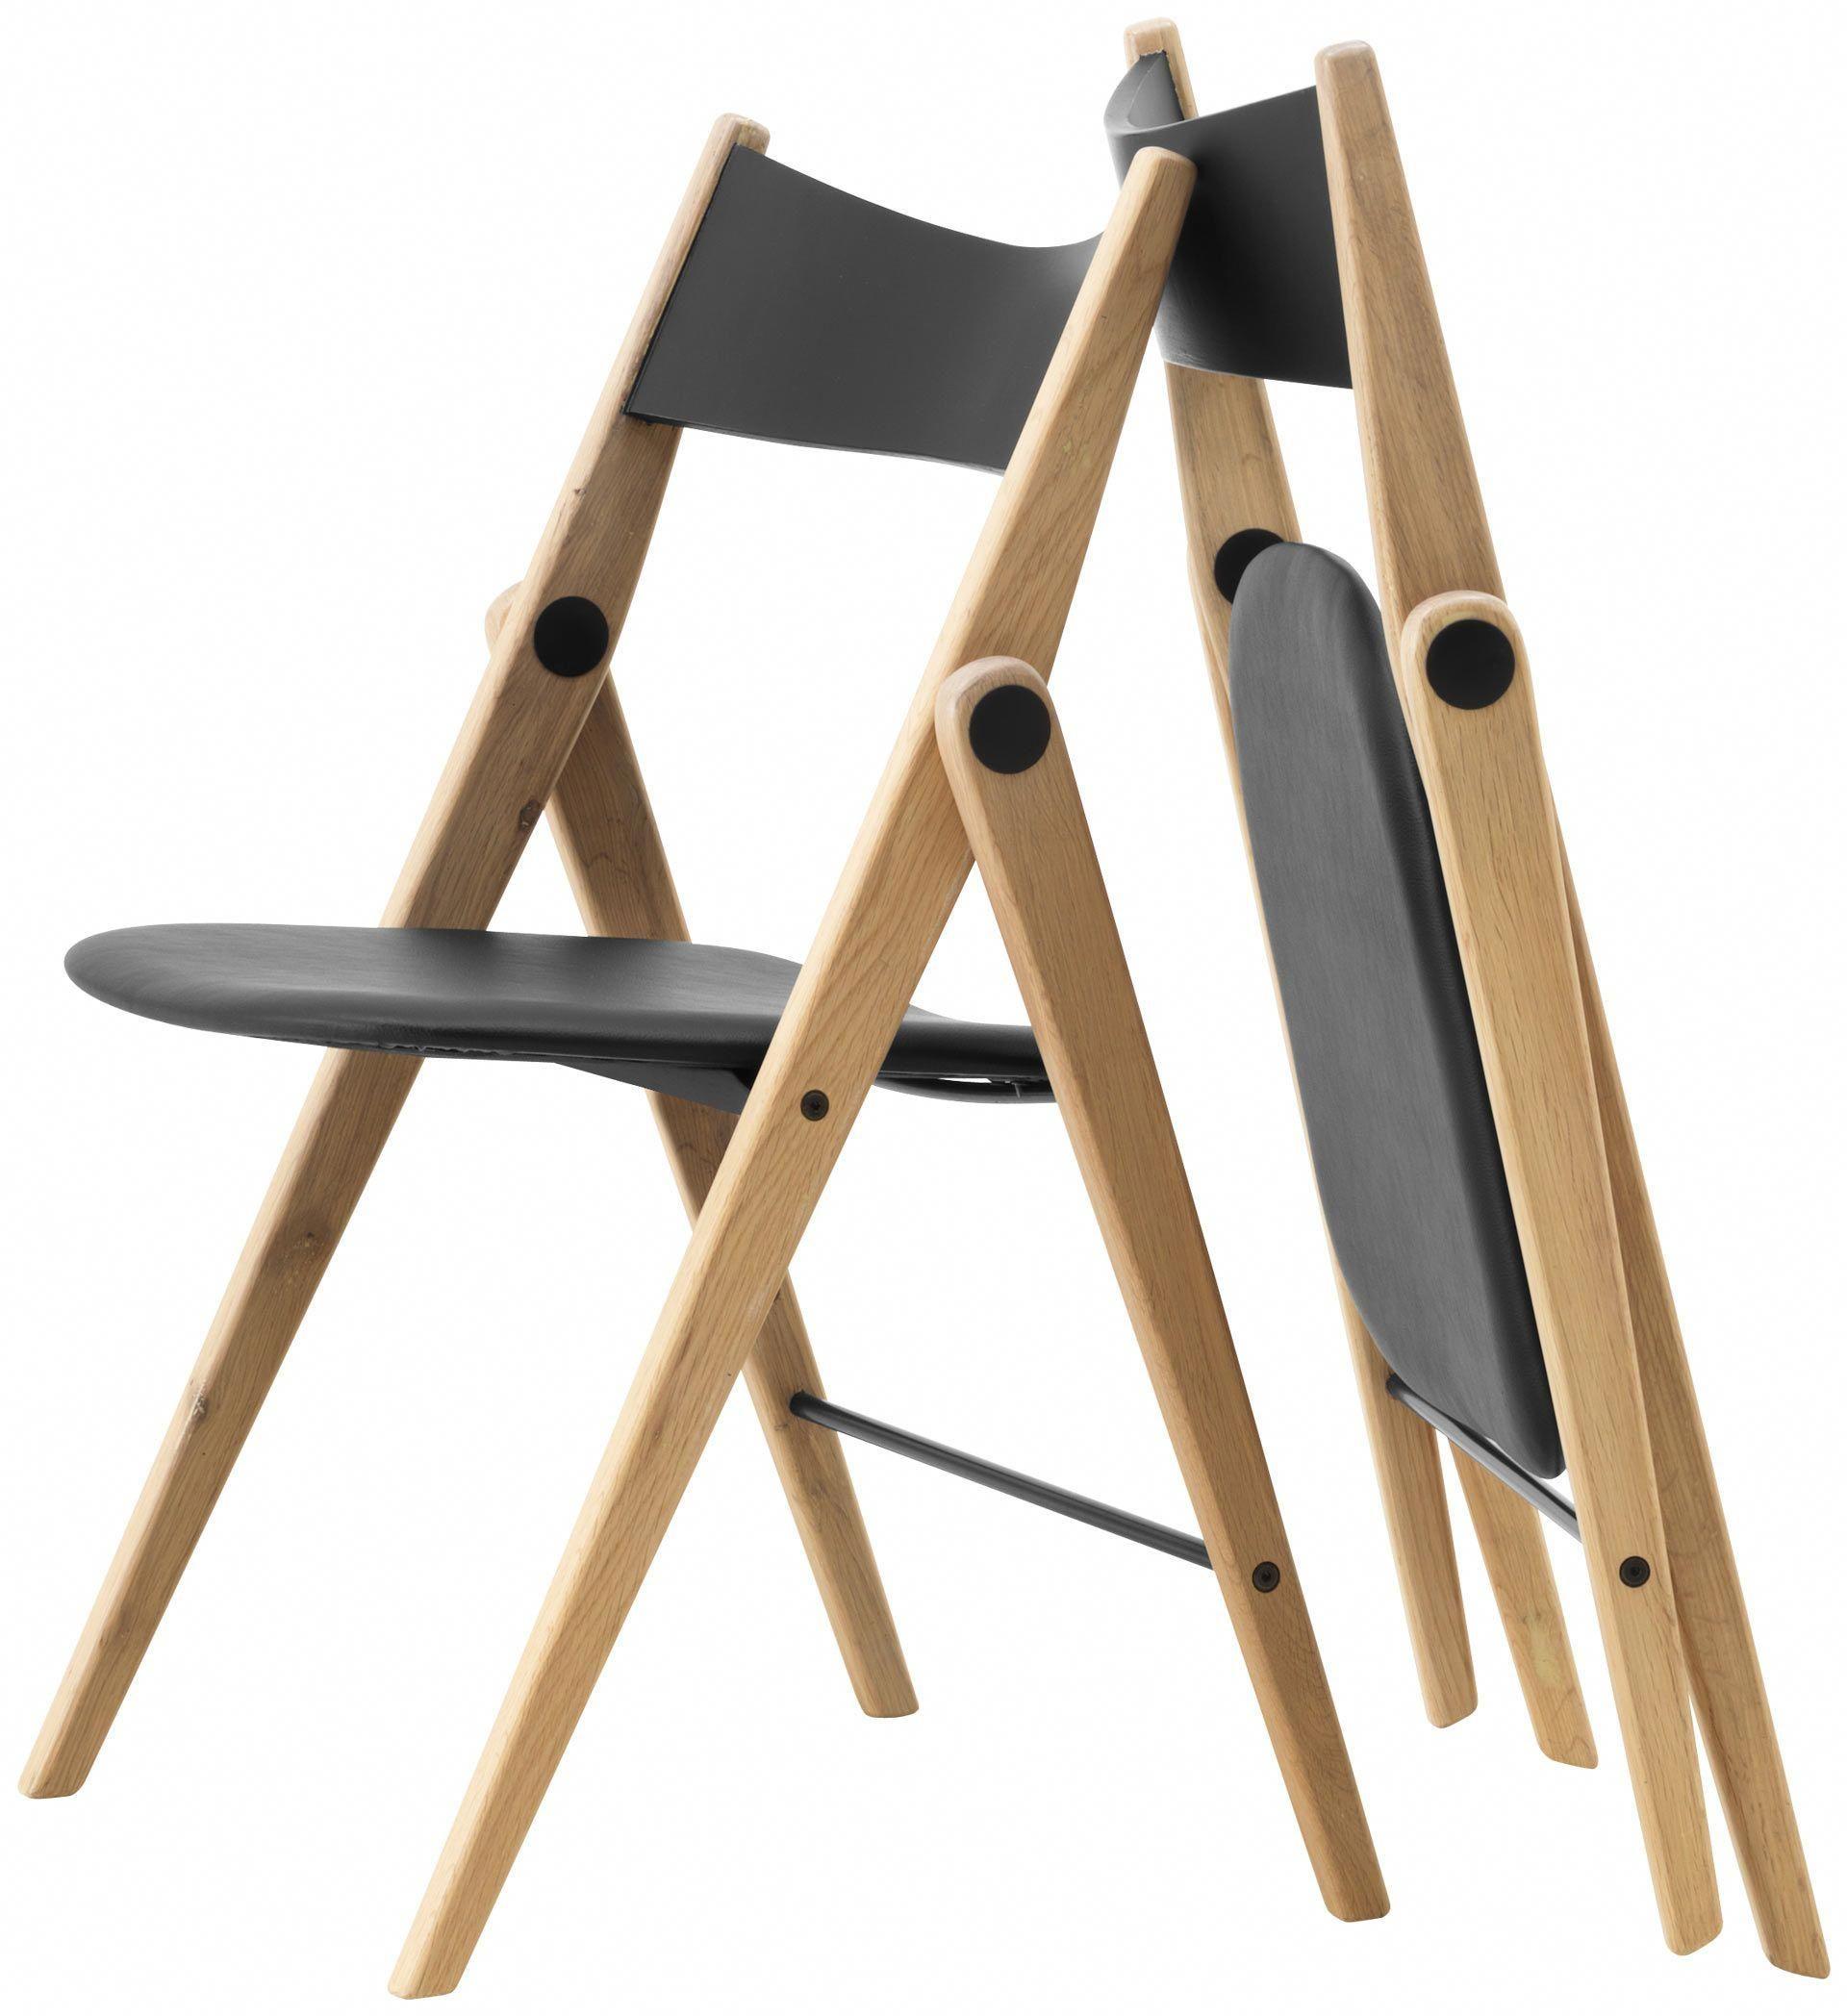 Modern Dining Chairs Contemporary Dining Chairs Boconcept Sillascomedor Stuhl Design Moderne Stuhle Esstisch Design